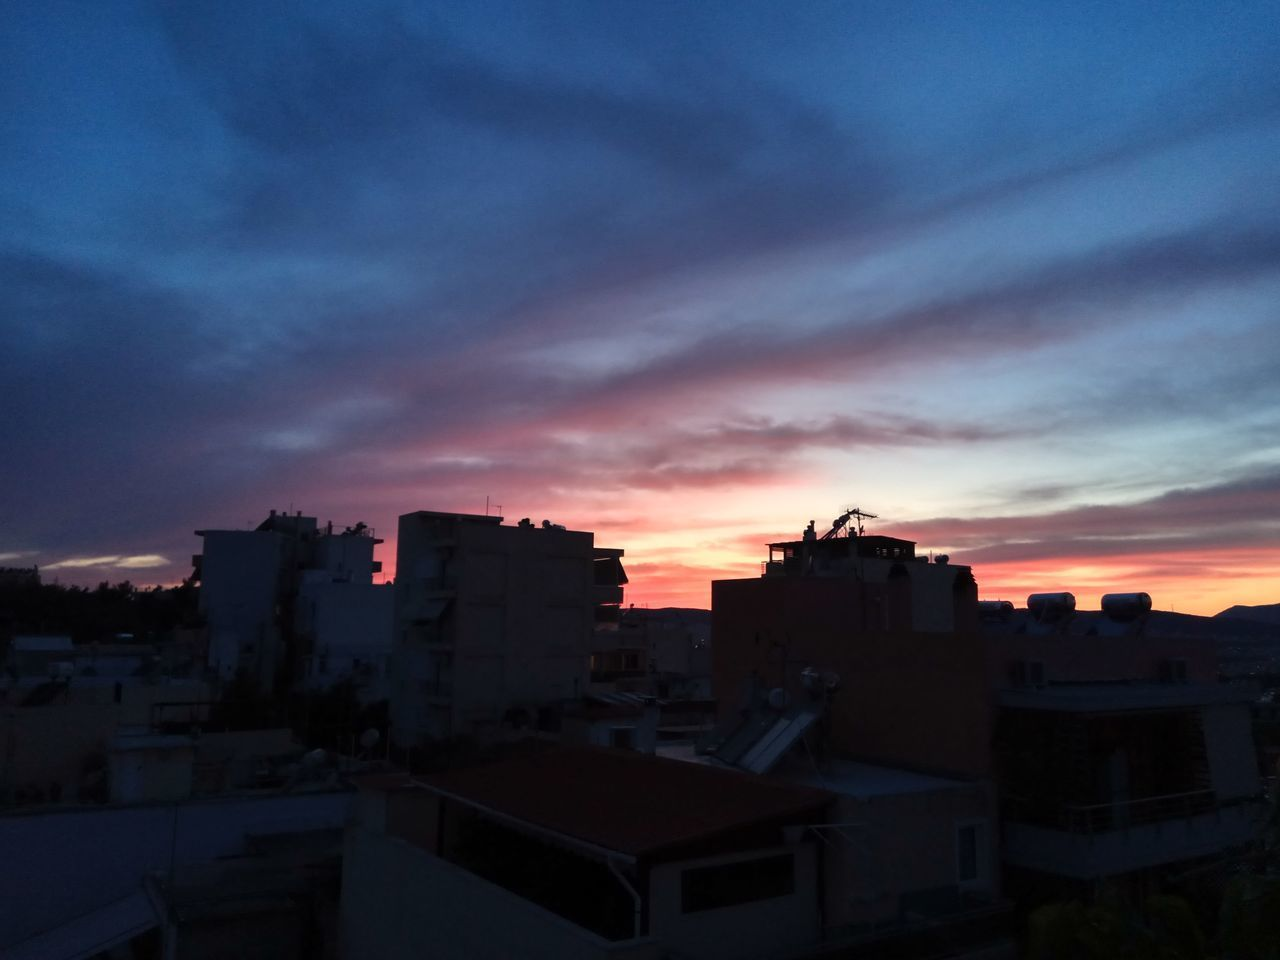 architecture, sunset, building exterior, built structure, sky, no people, outdoors, cityscape, nature, city